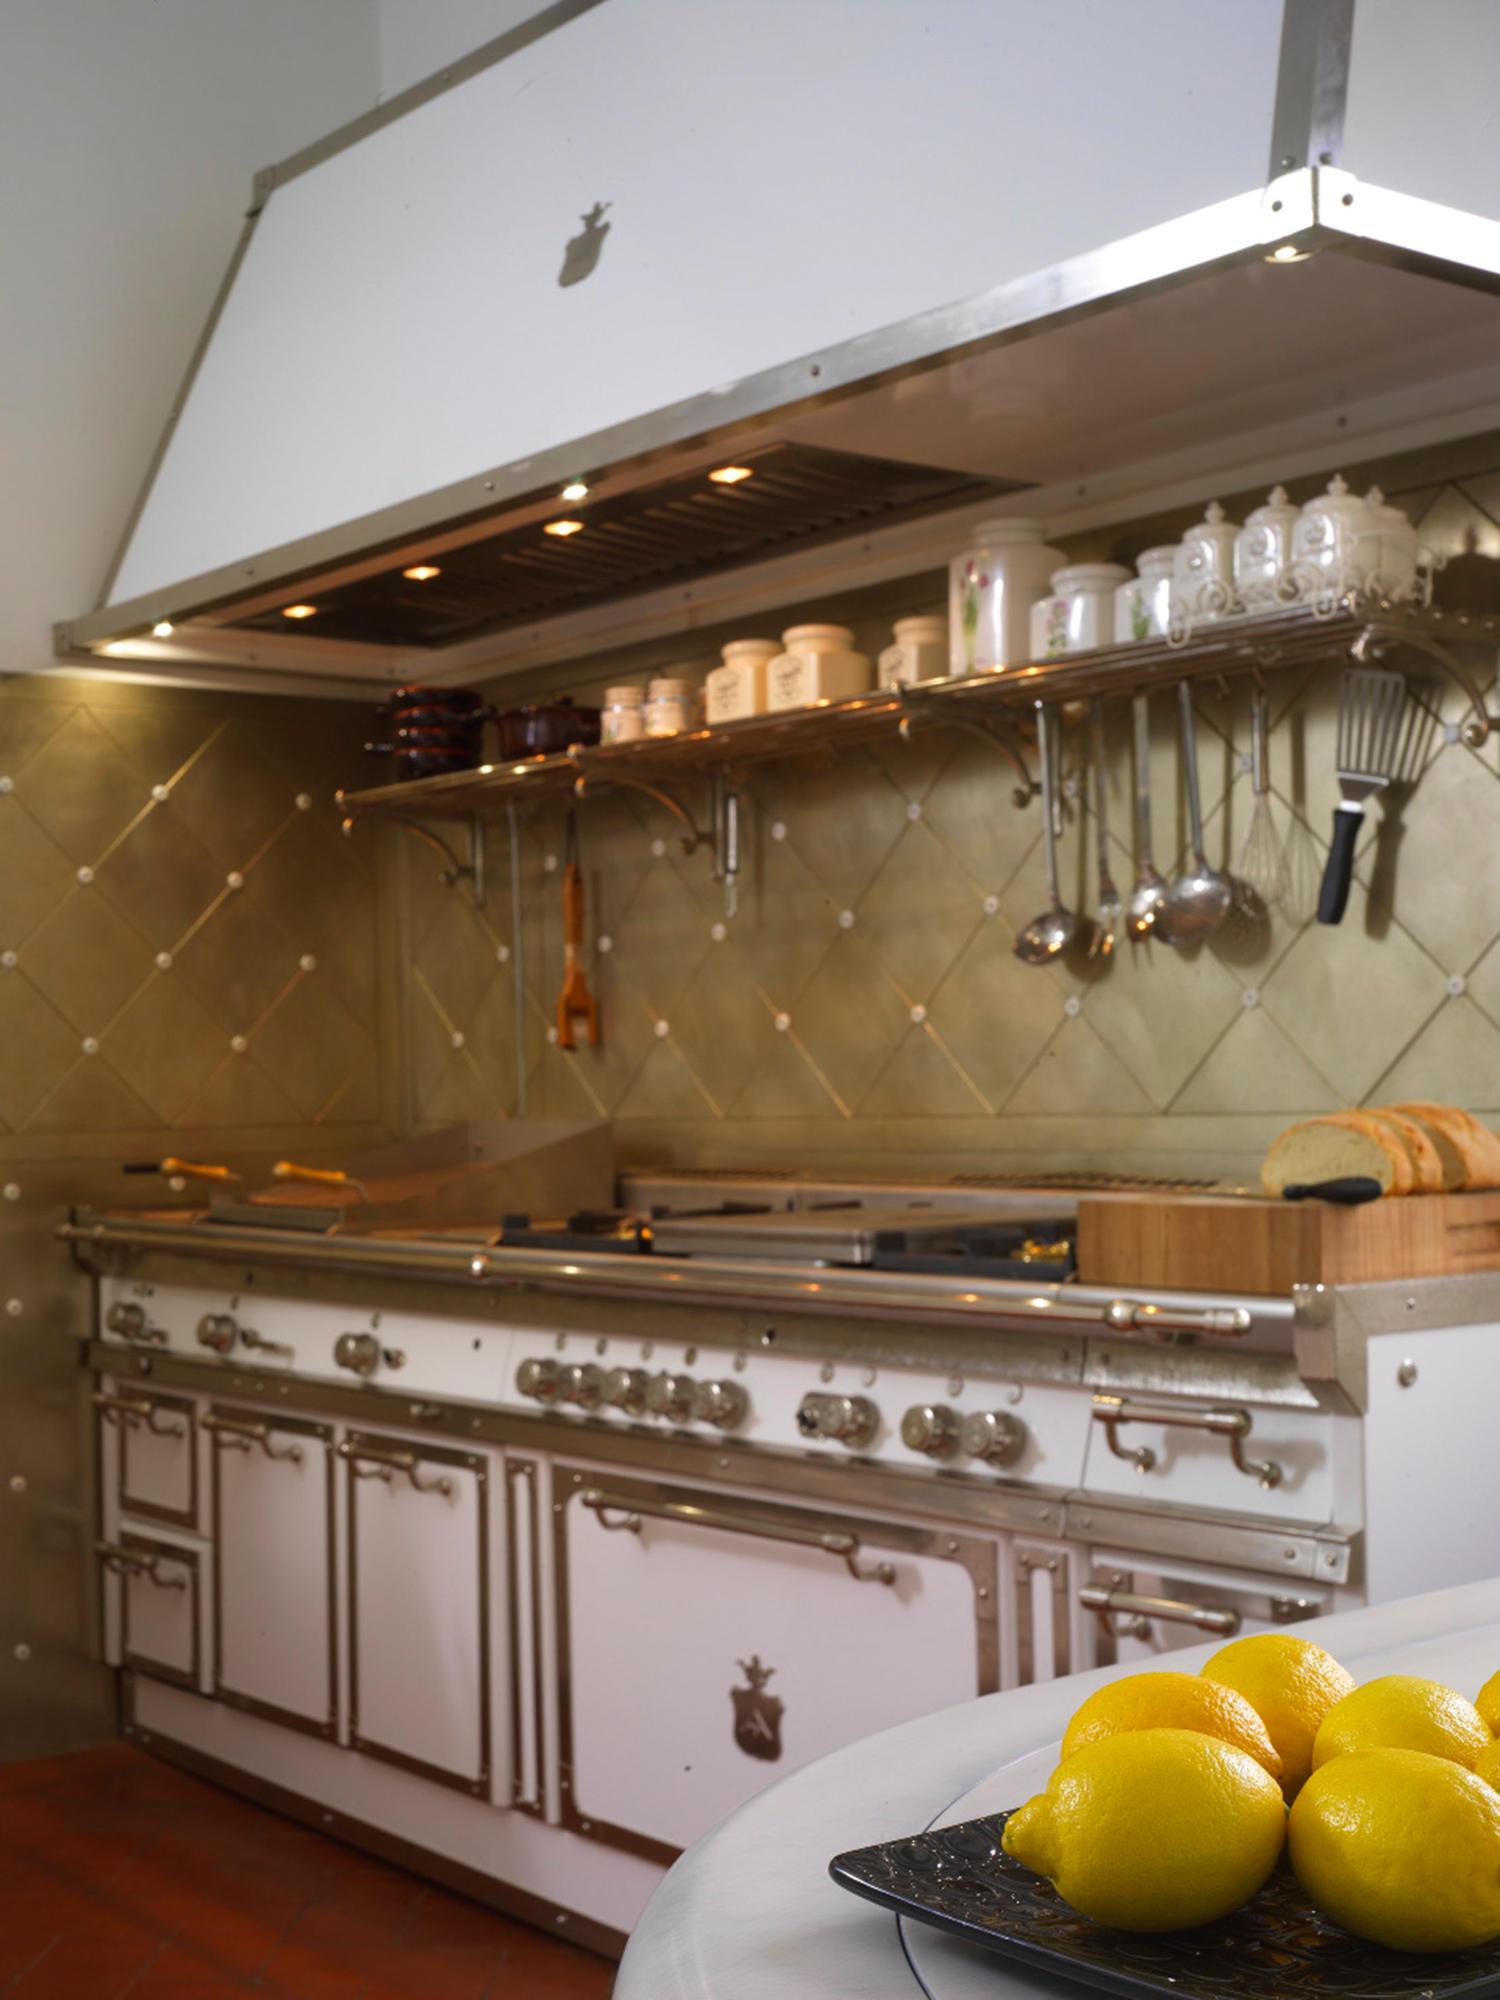 PITTI PALACE CUCINE - Cucine a parete Officine Gullo | Architonic